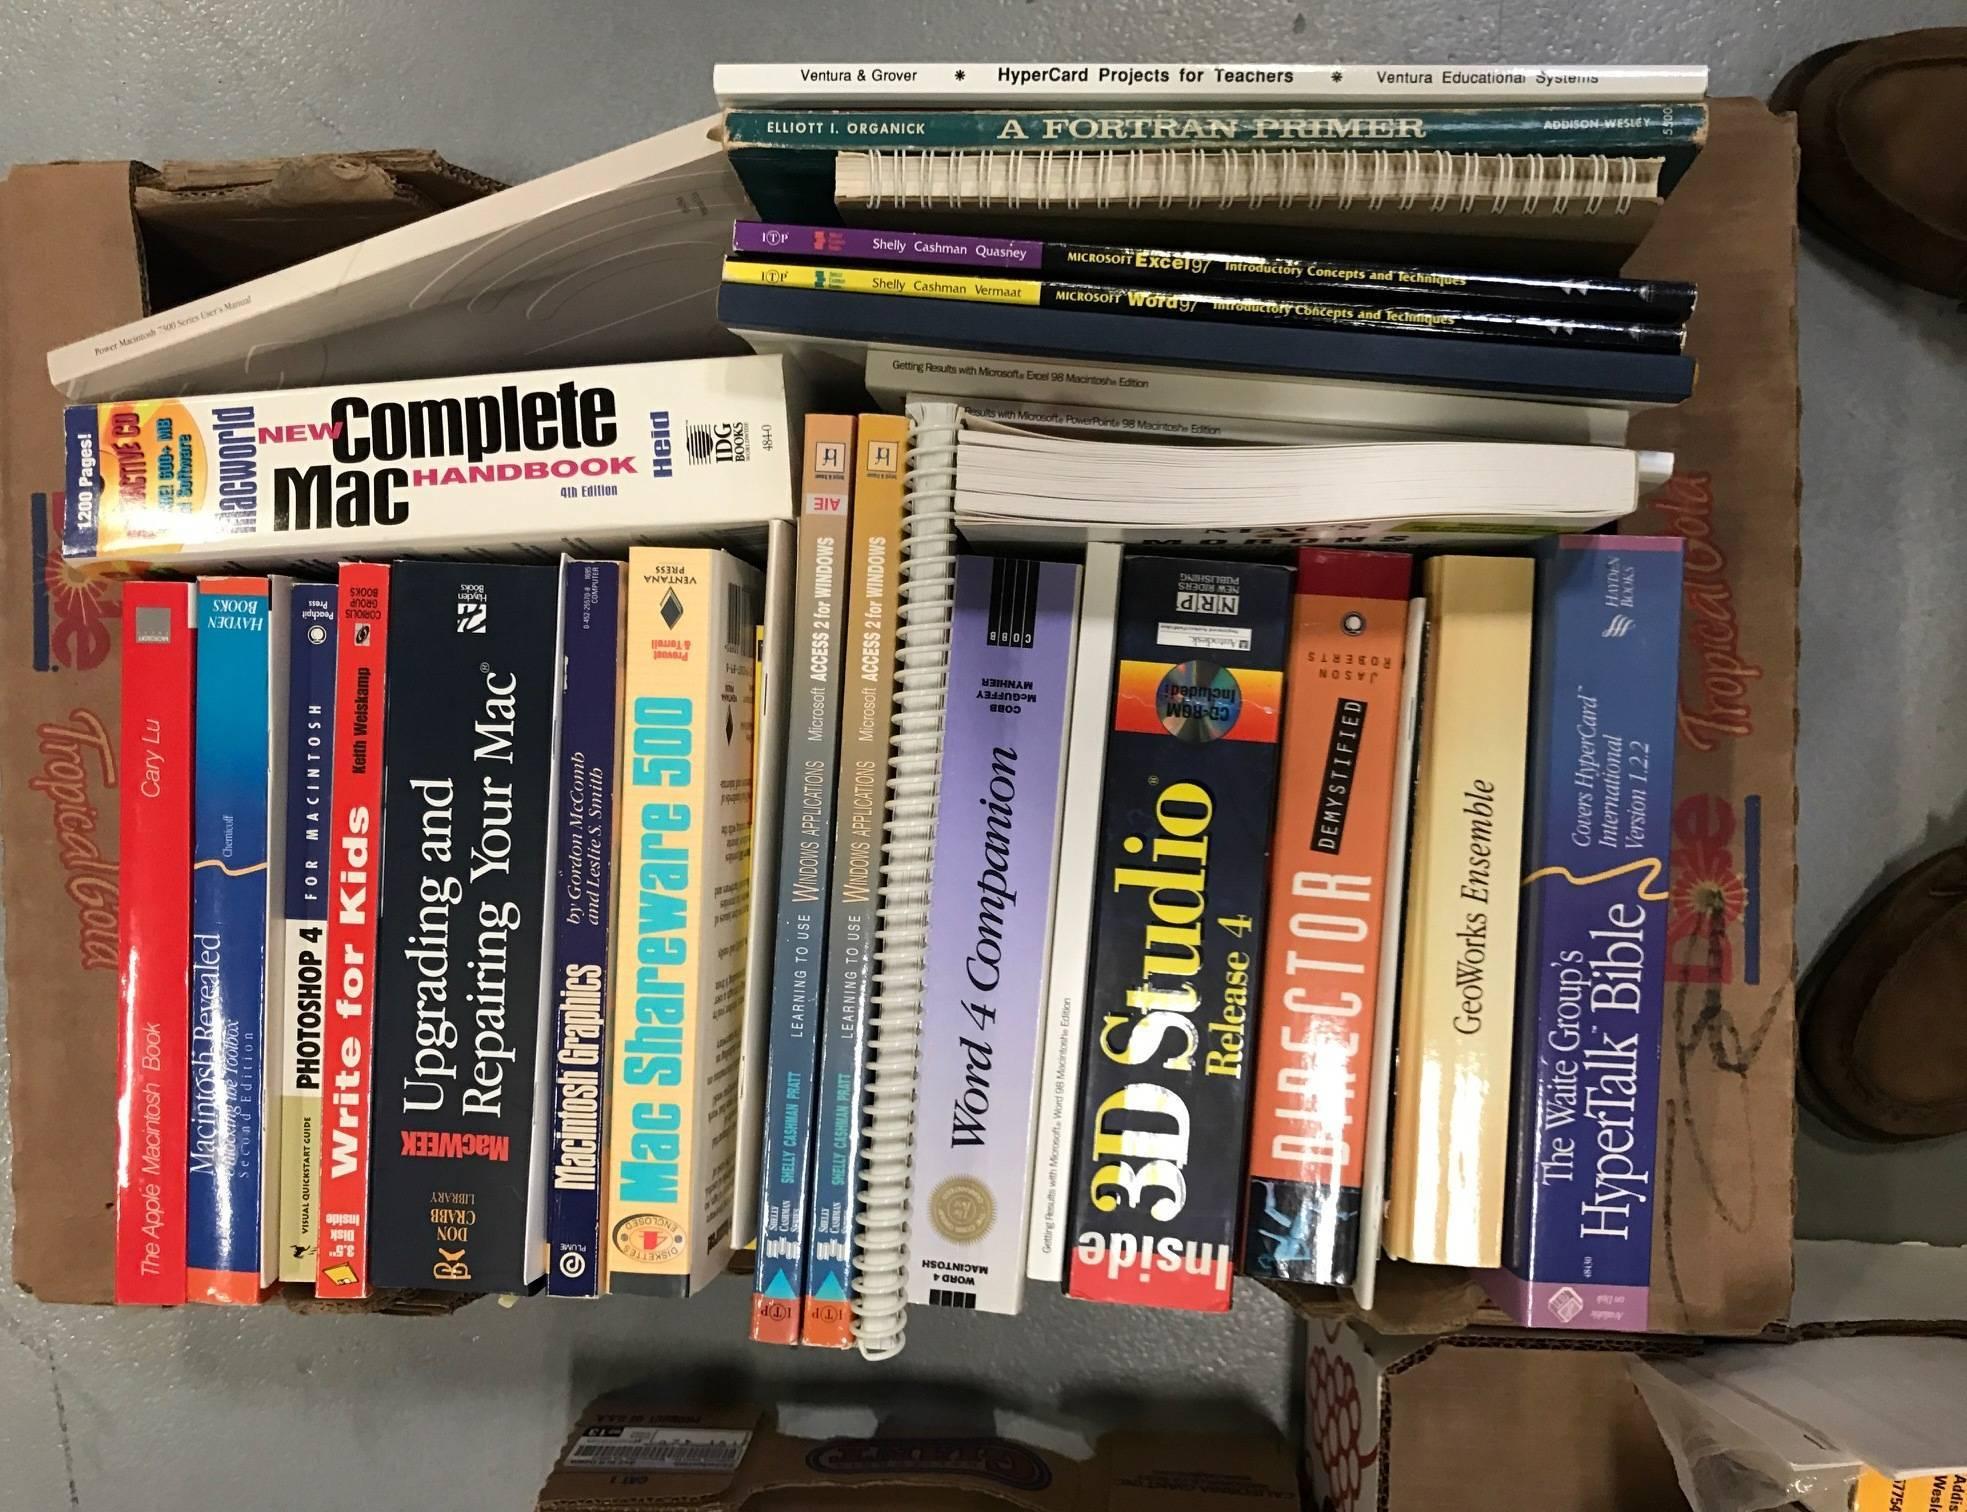 161c2f8b97b6079ca8be_bodnarpixcomputerbooks.JPG